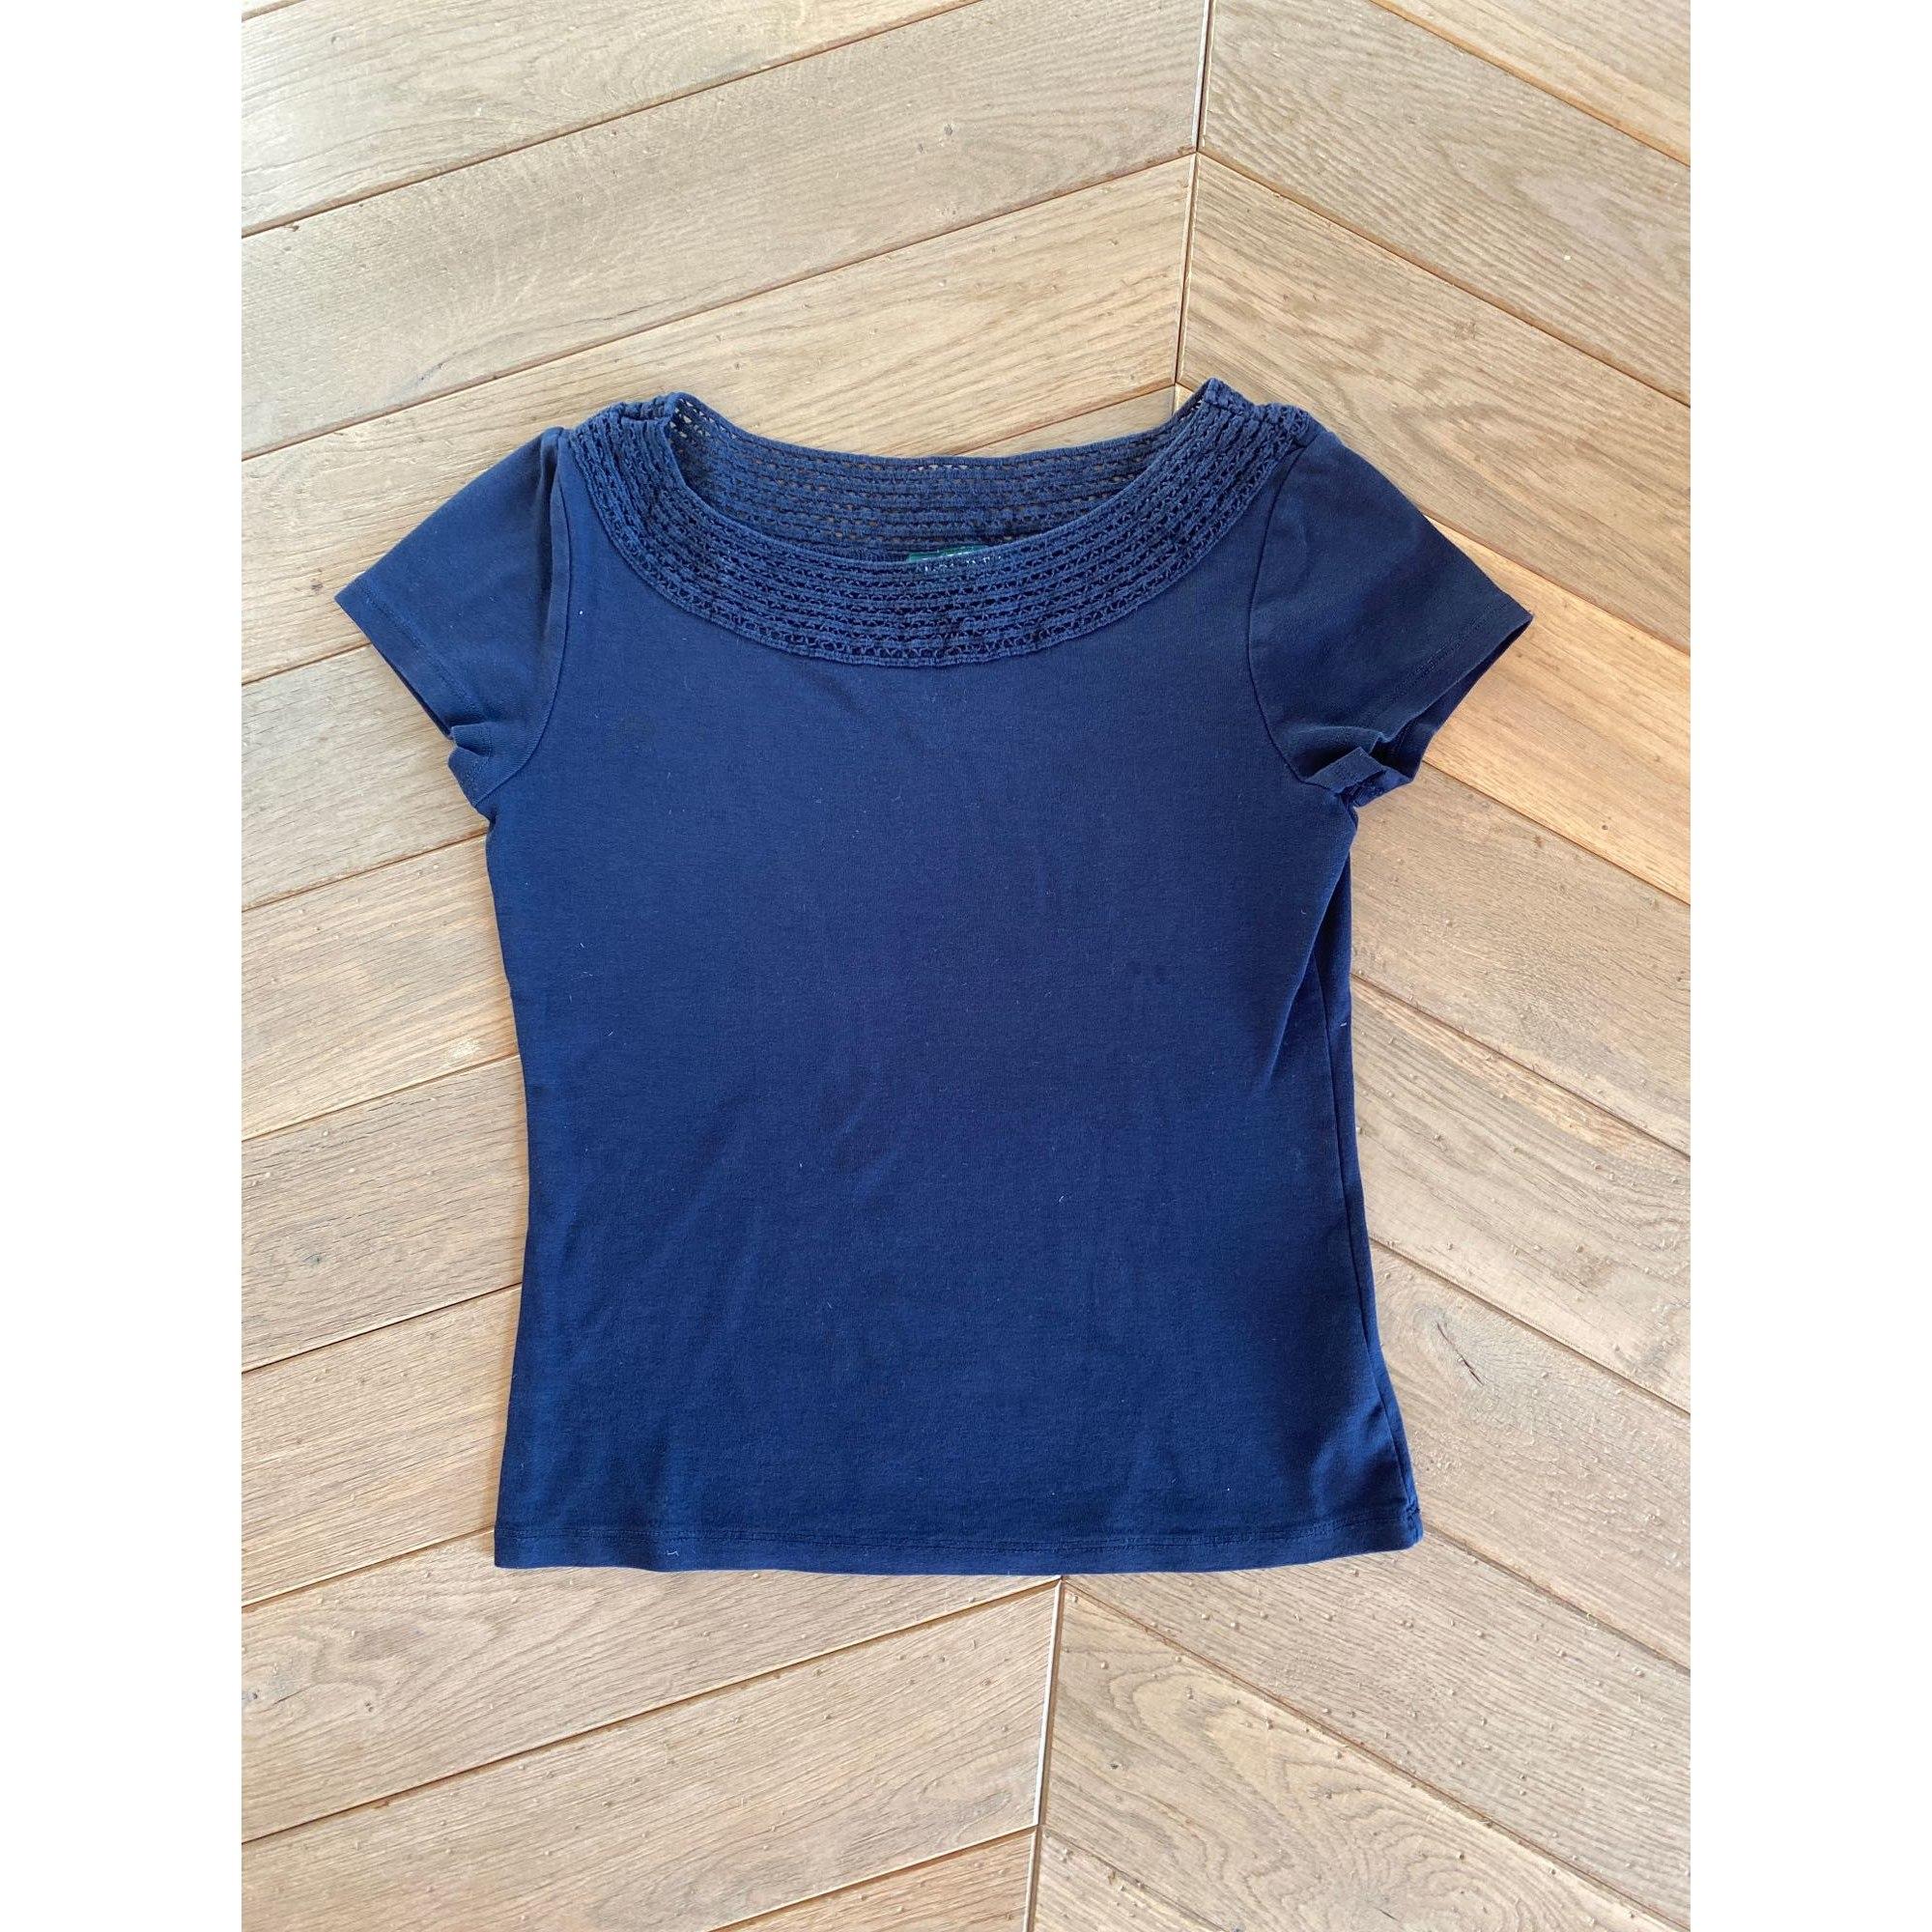 Top, tee-shirt RALPH LAUREN Bleu, bleu marine, bleu turquoise